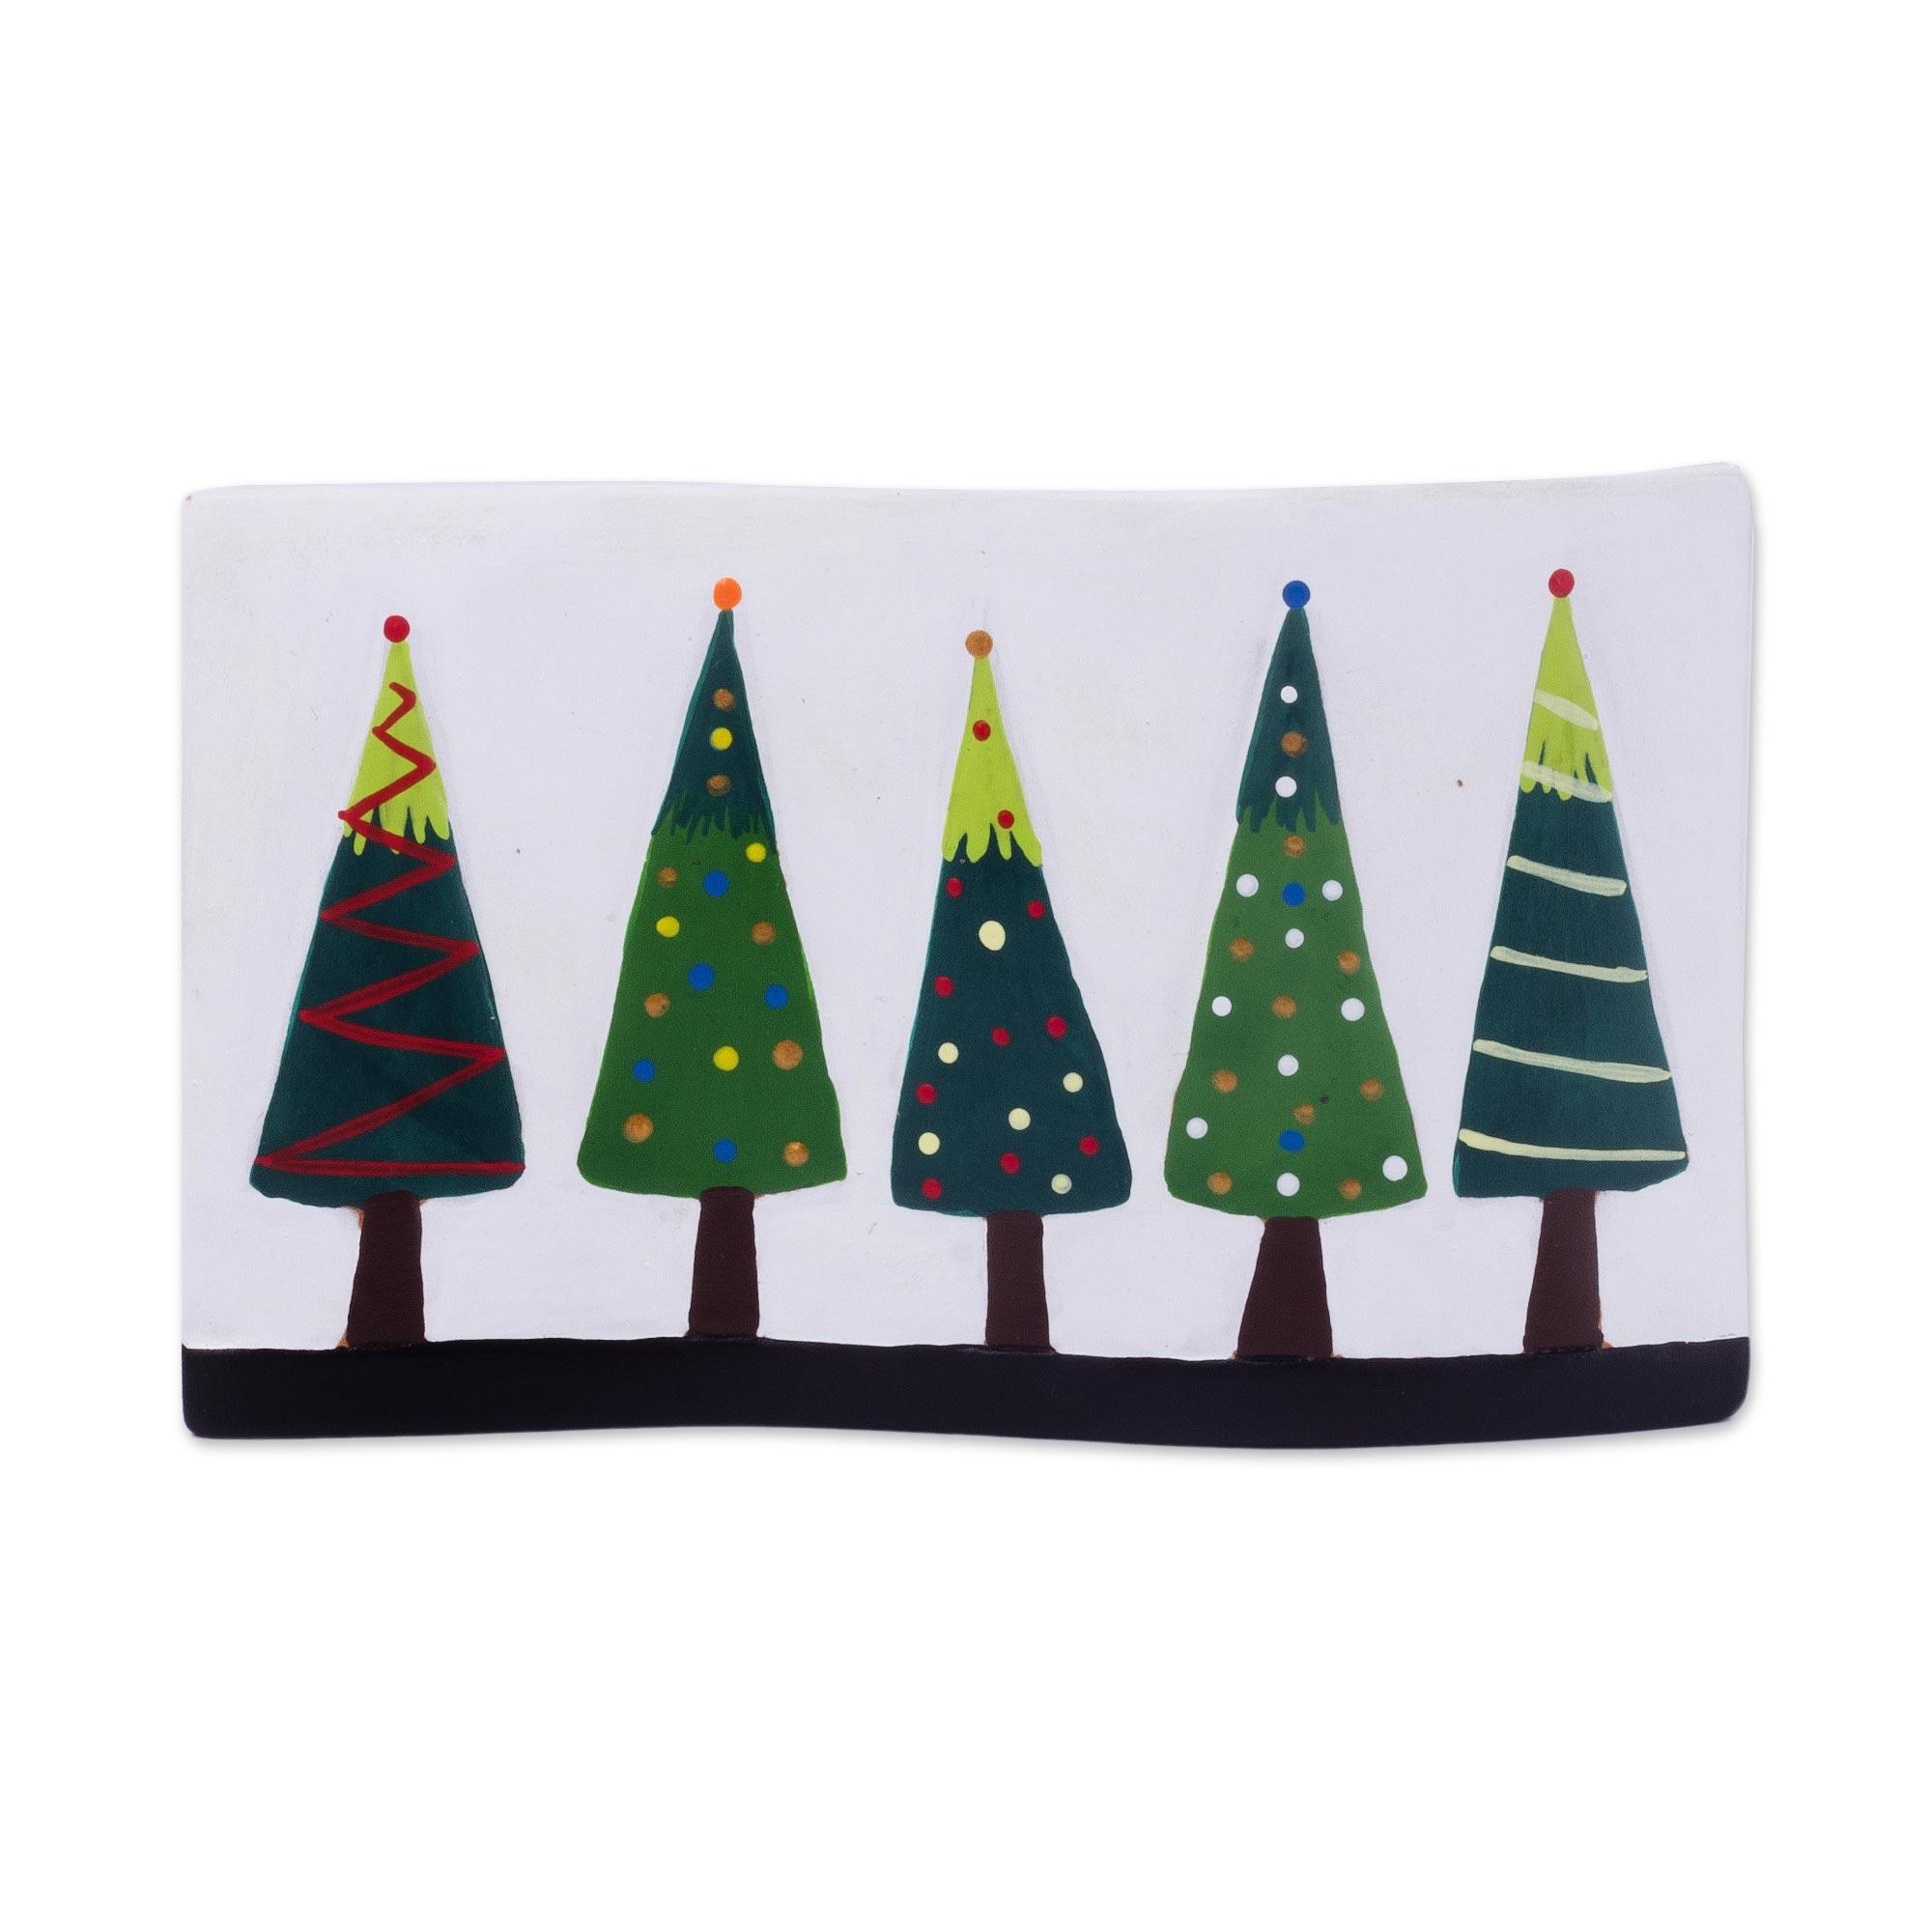 Unicef Market Ceramic Christmas Tree Decorative Accent From Peru